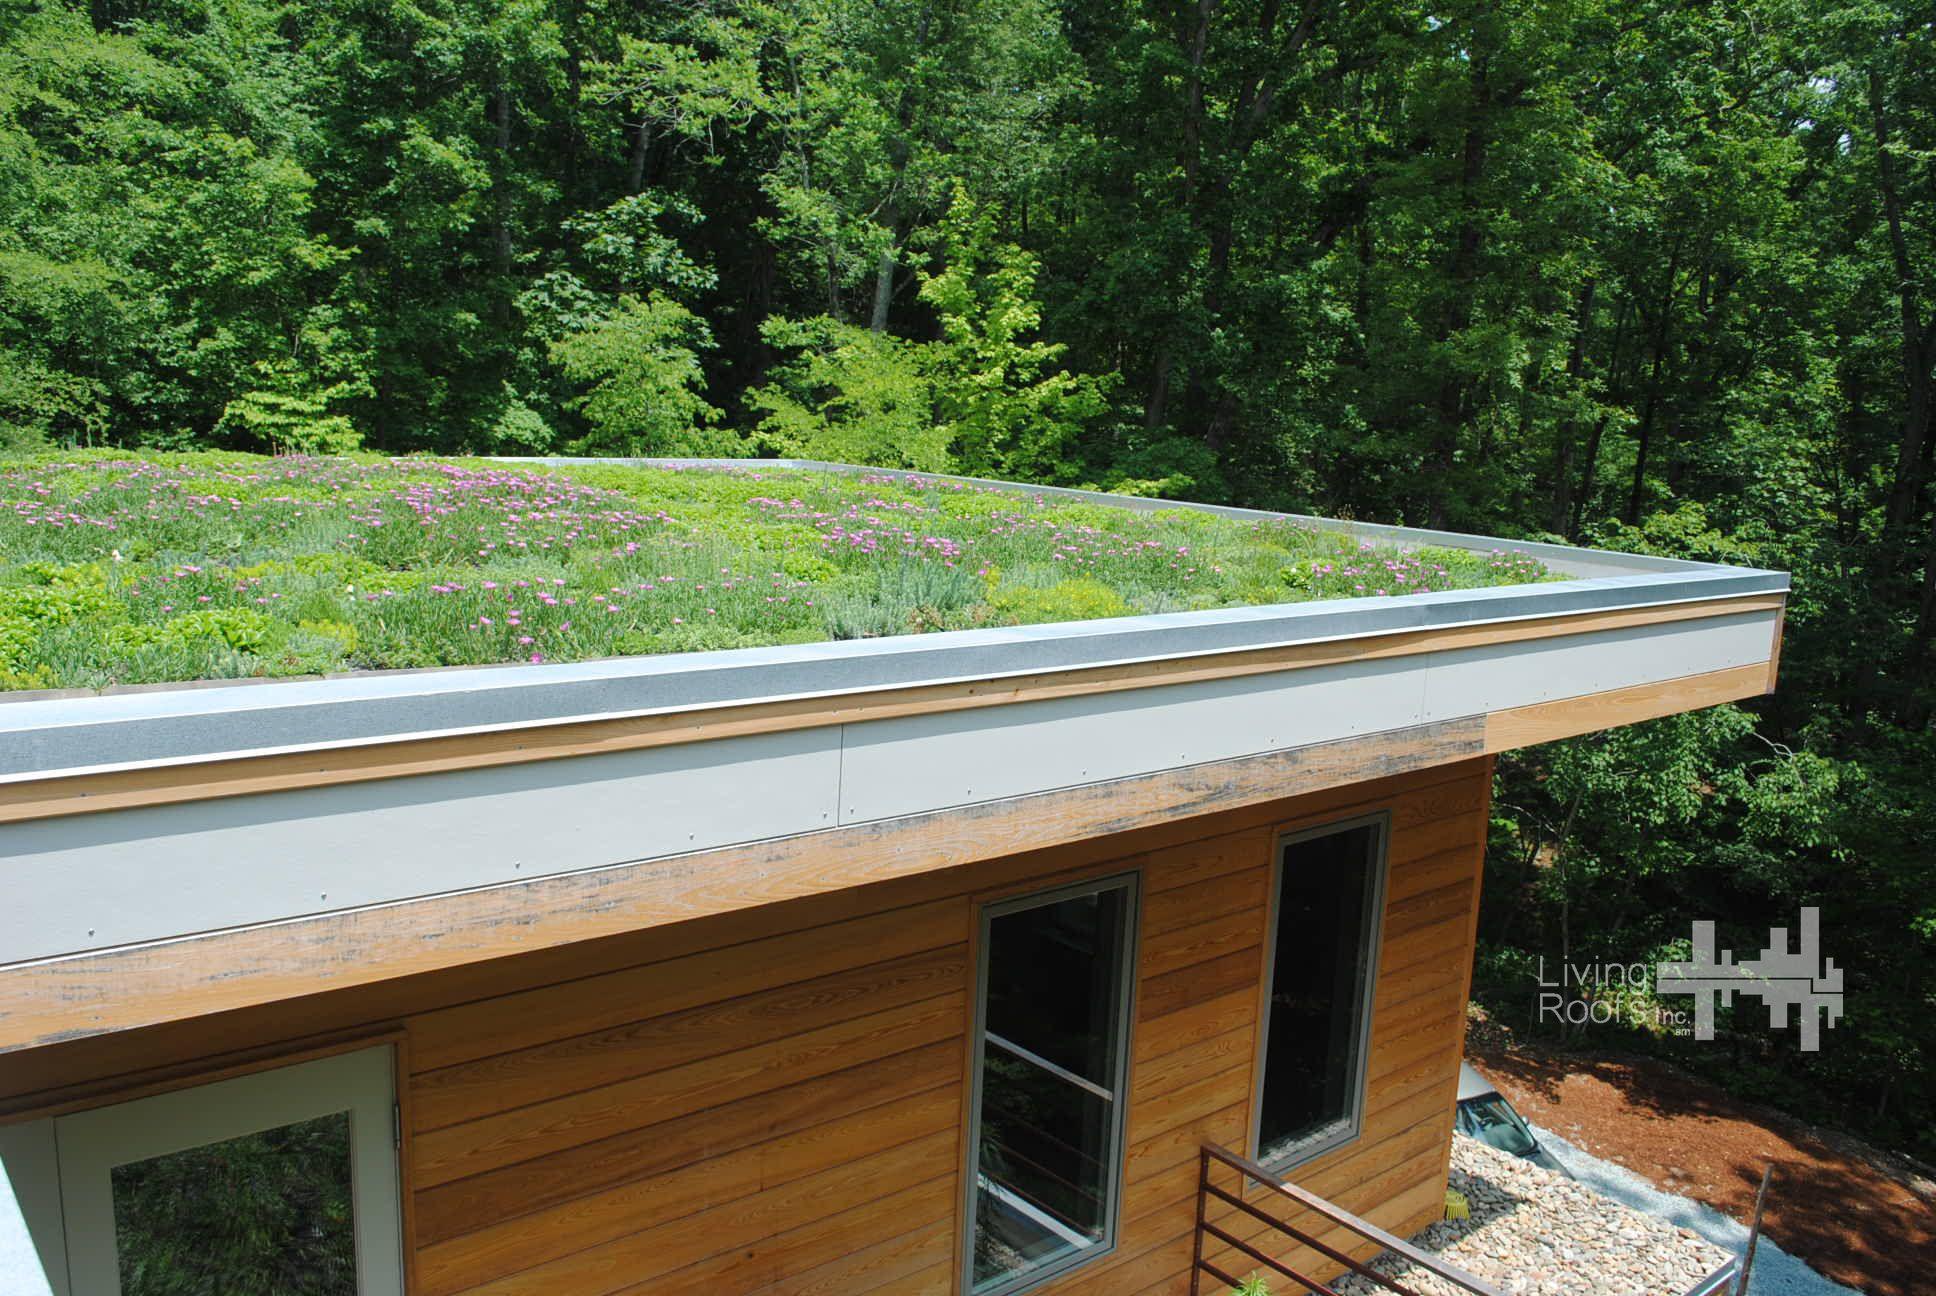 Residential Living Roof Green Roof Design Green Roof Residential Green Roof